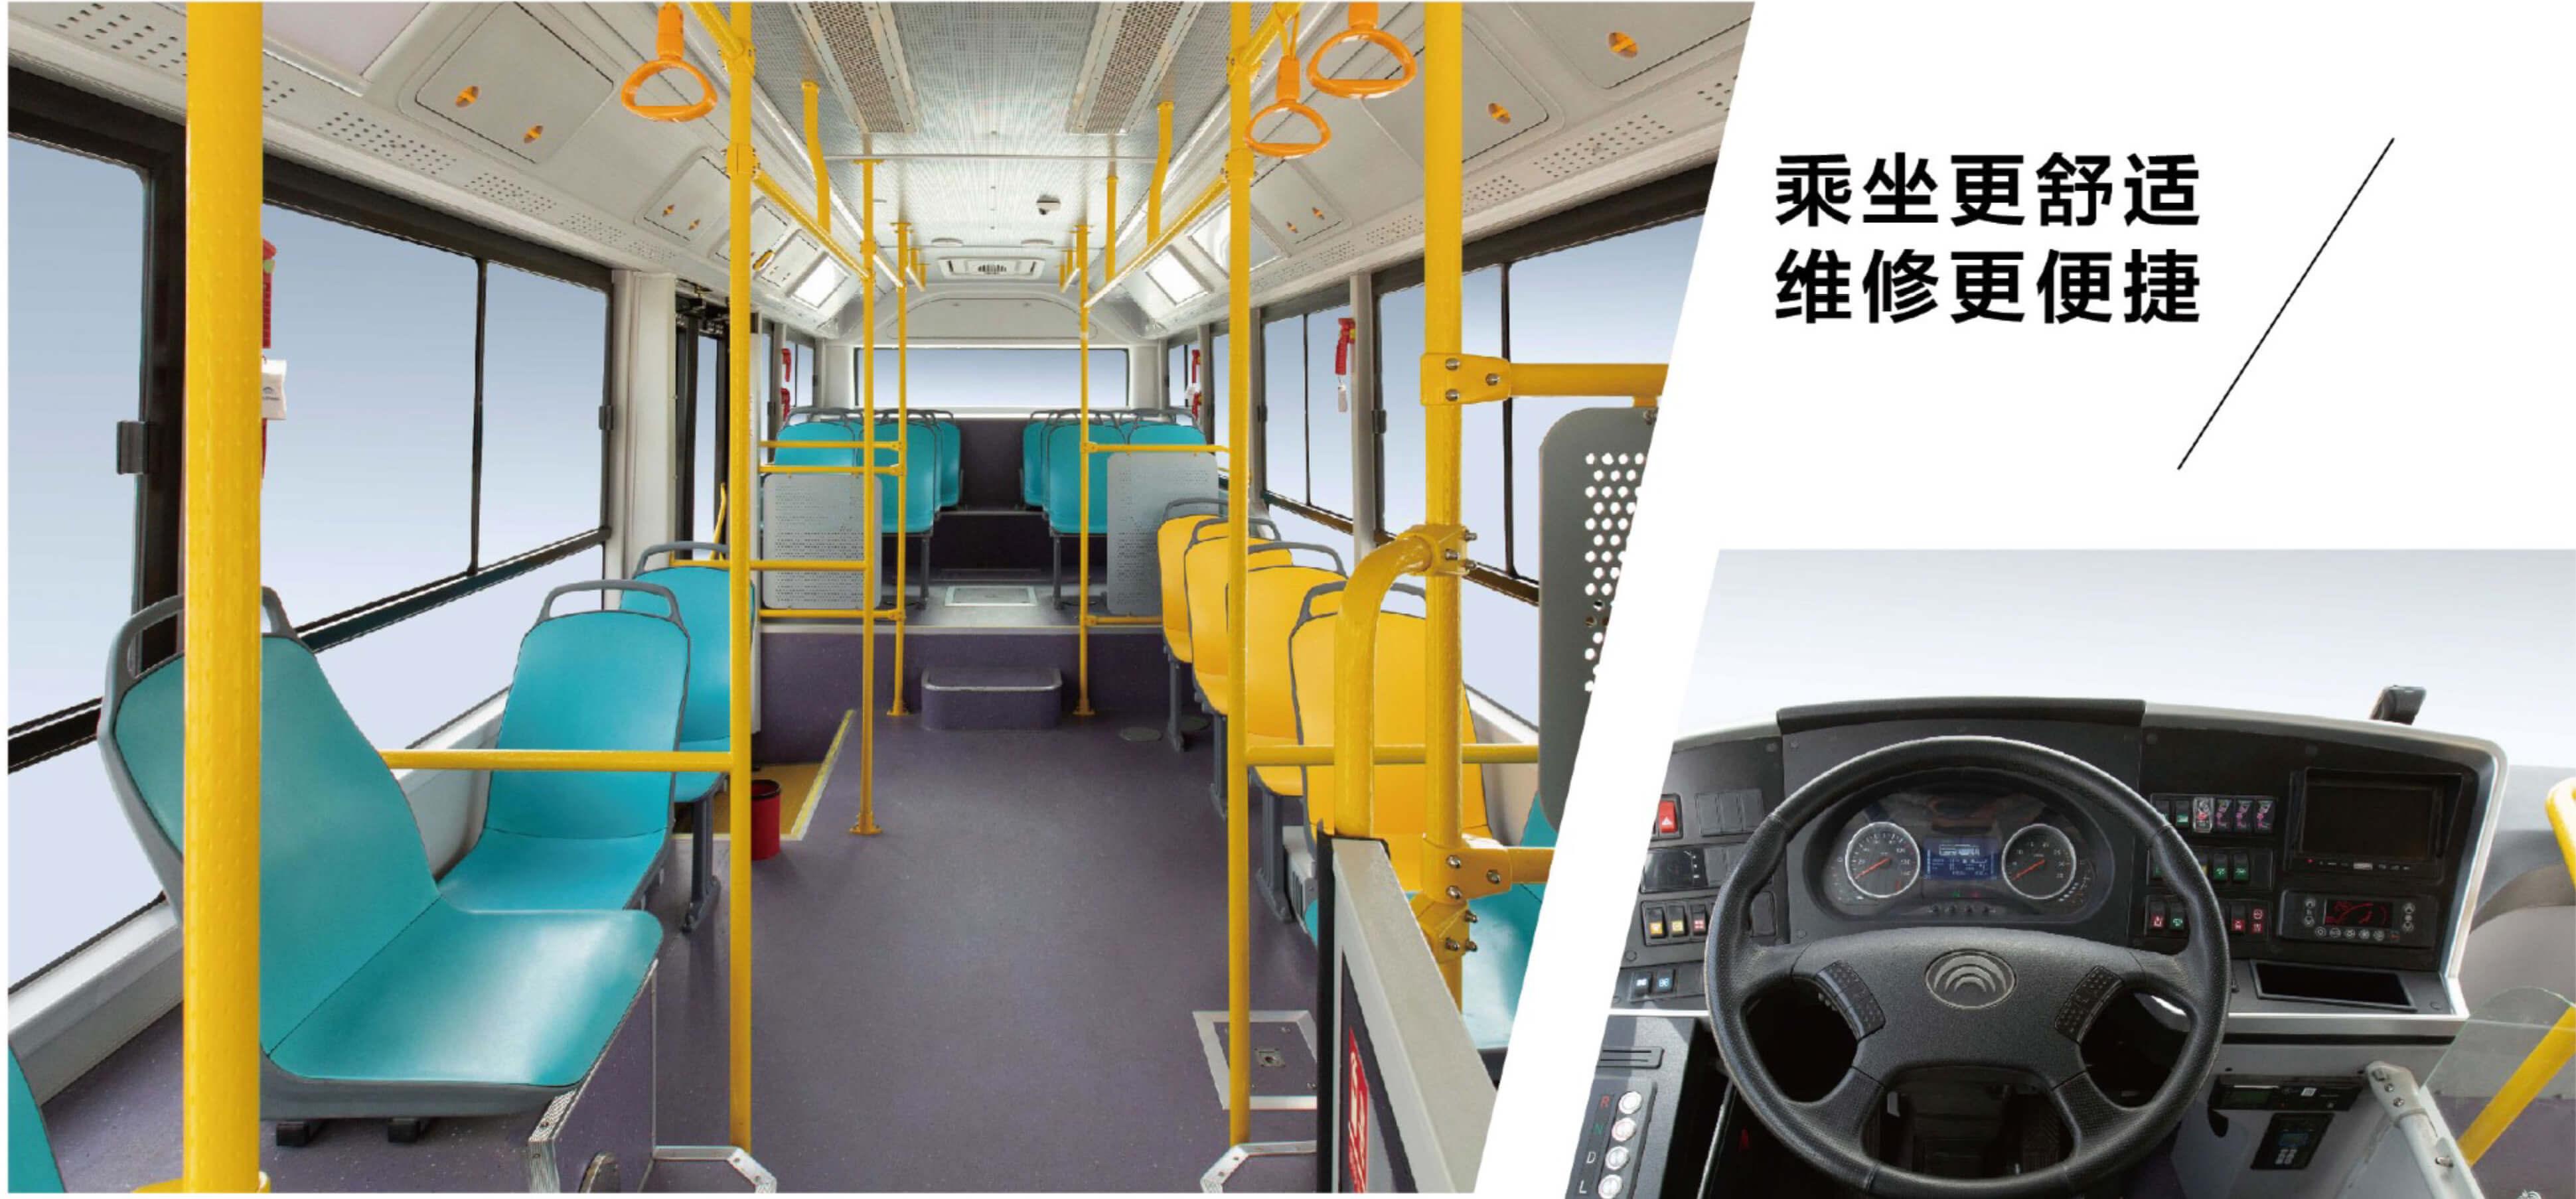 E12(公交新能源)